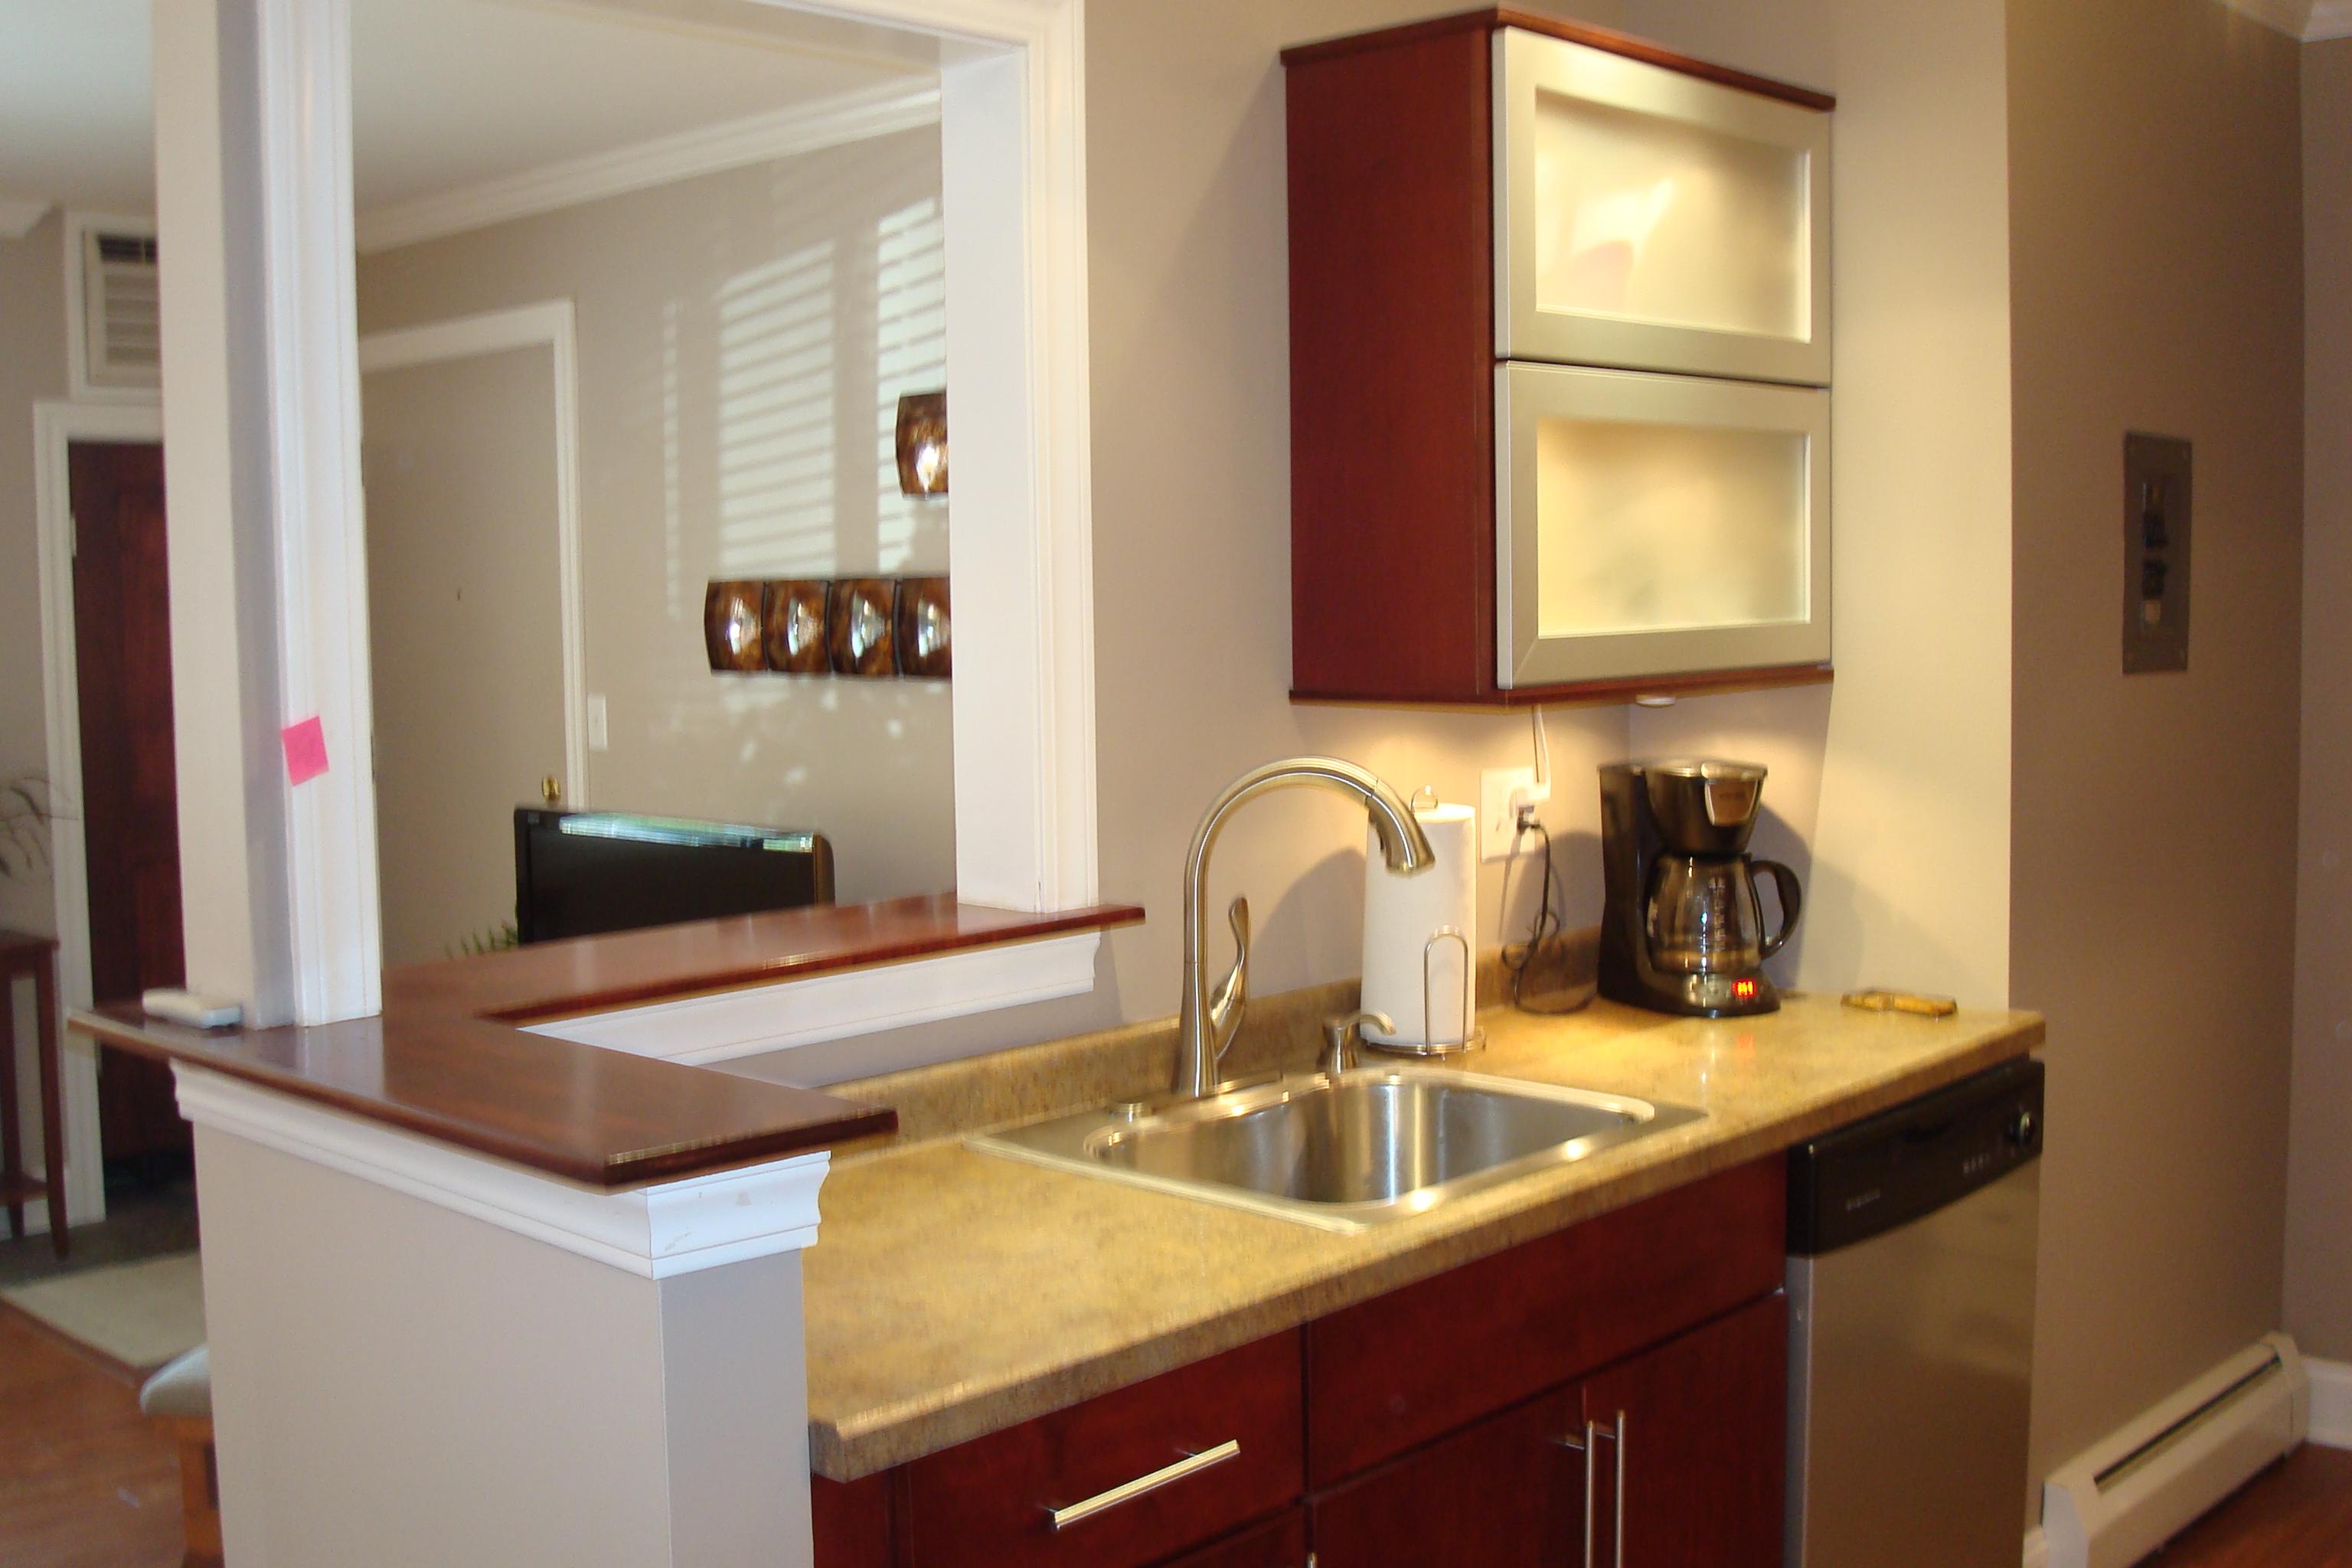 3 bedroom apartments grand rapids mi | modelismo-hld